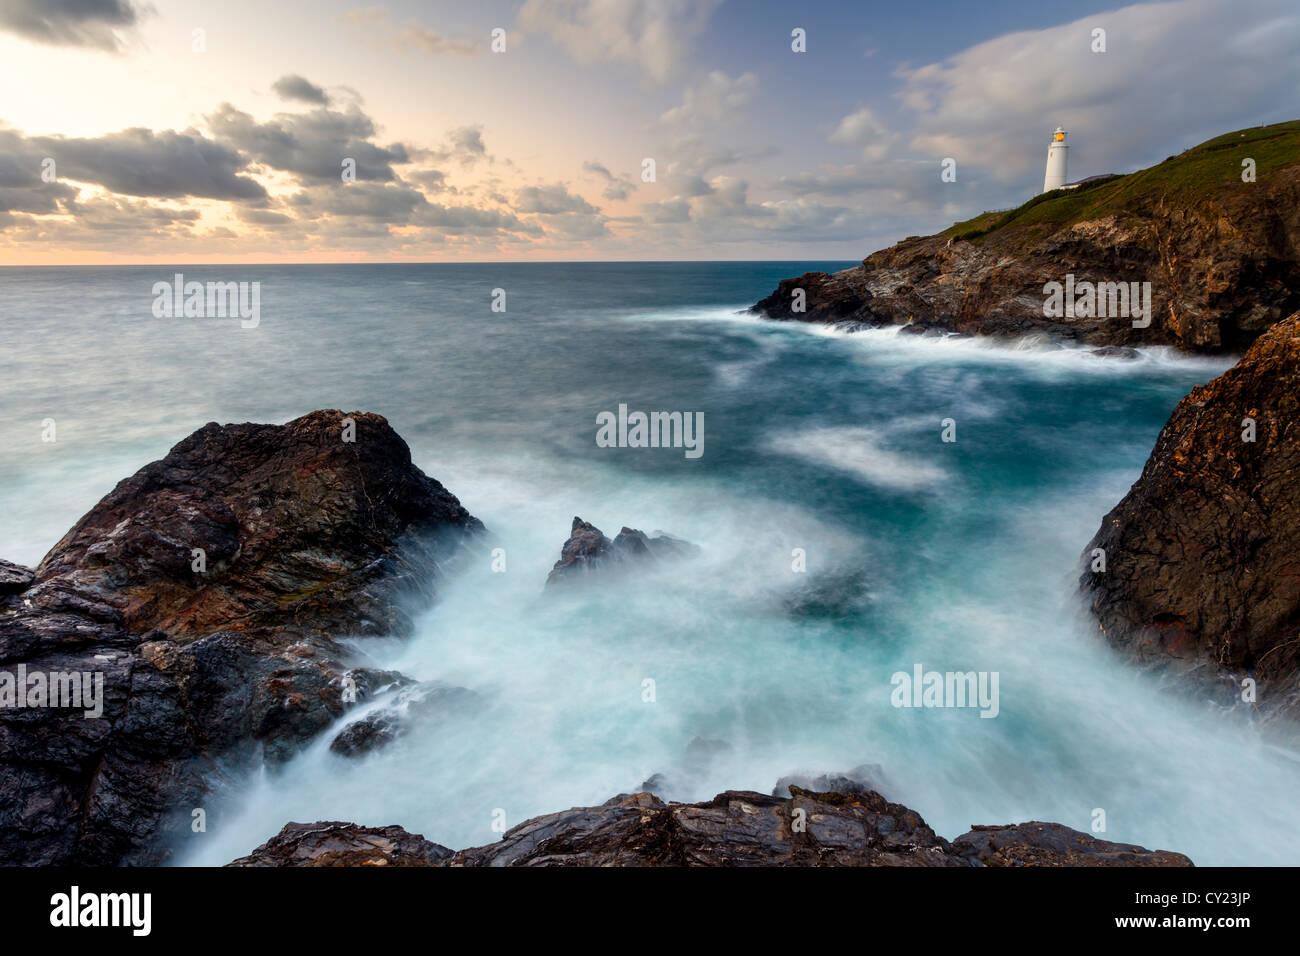 Views across Stinking Cove to Trevose Head from Dinas Head North Cornwall England UK - Stock Image